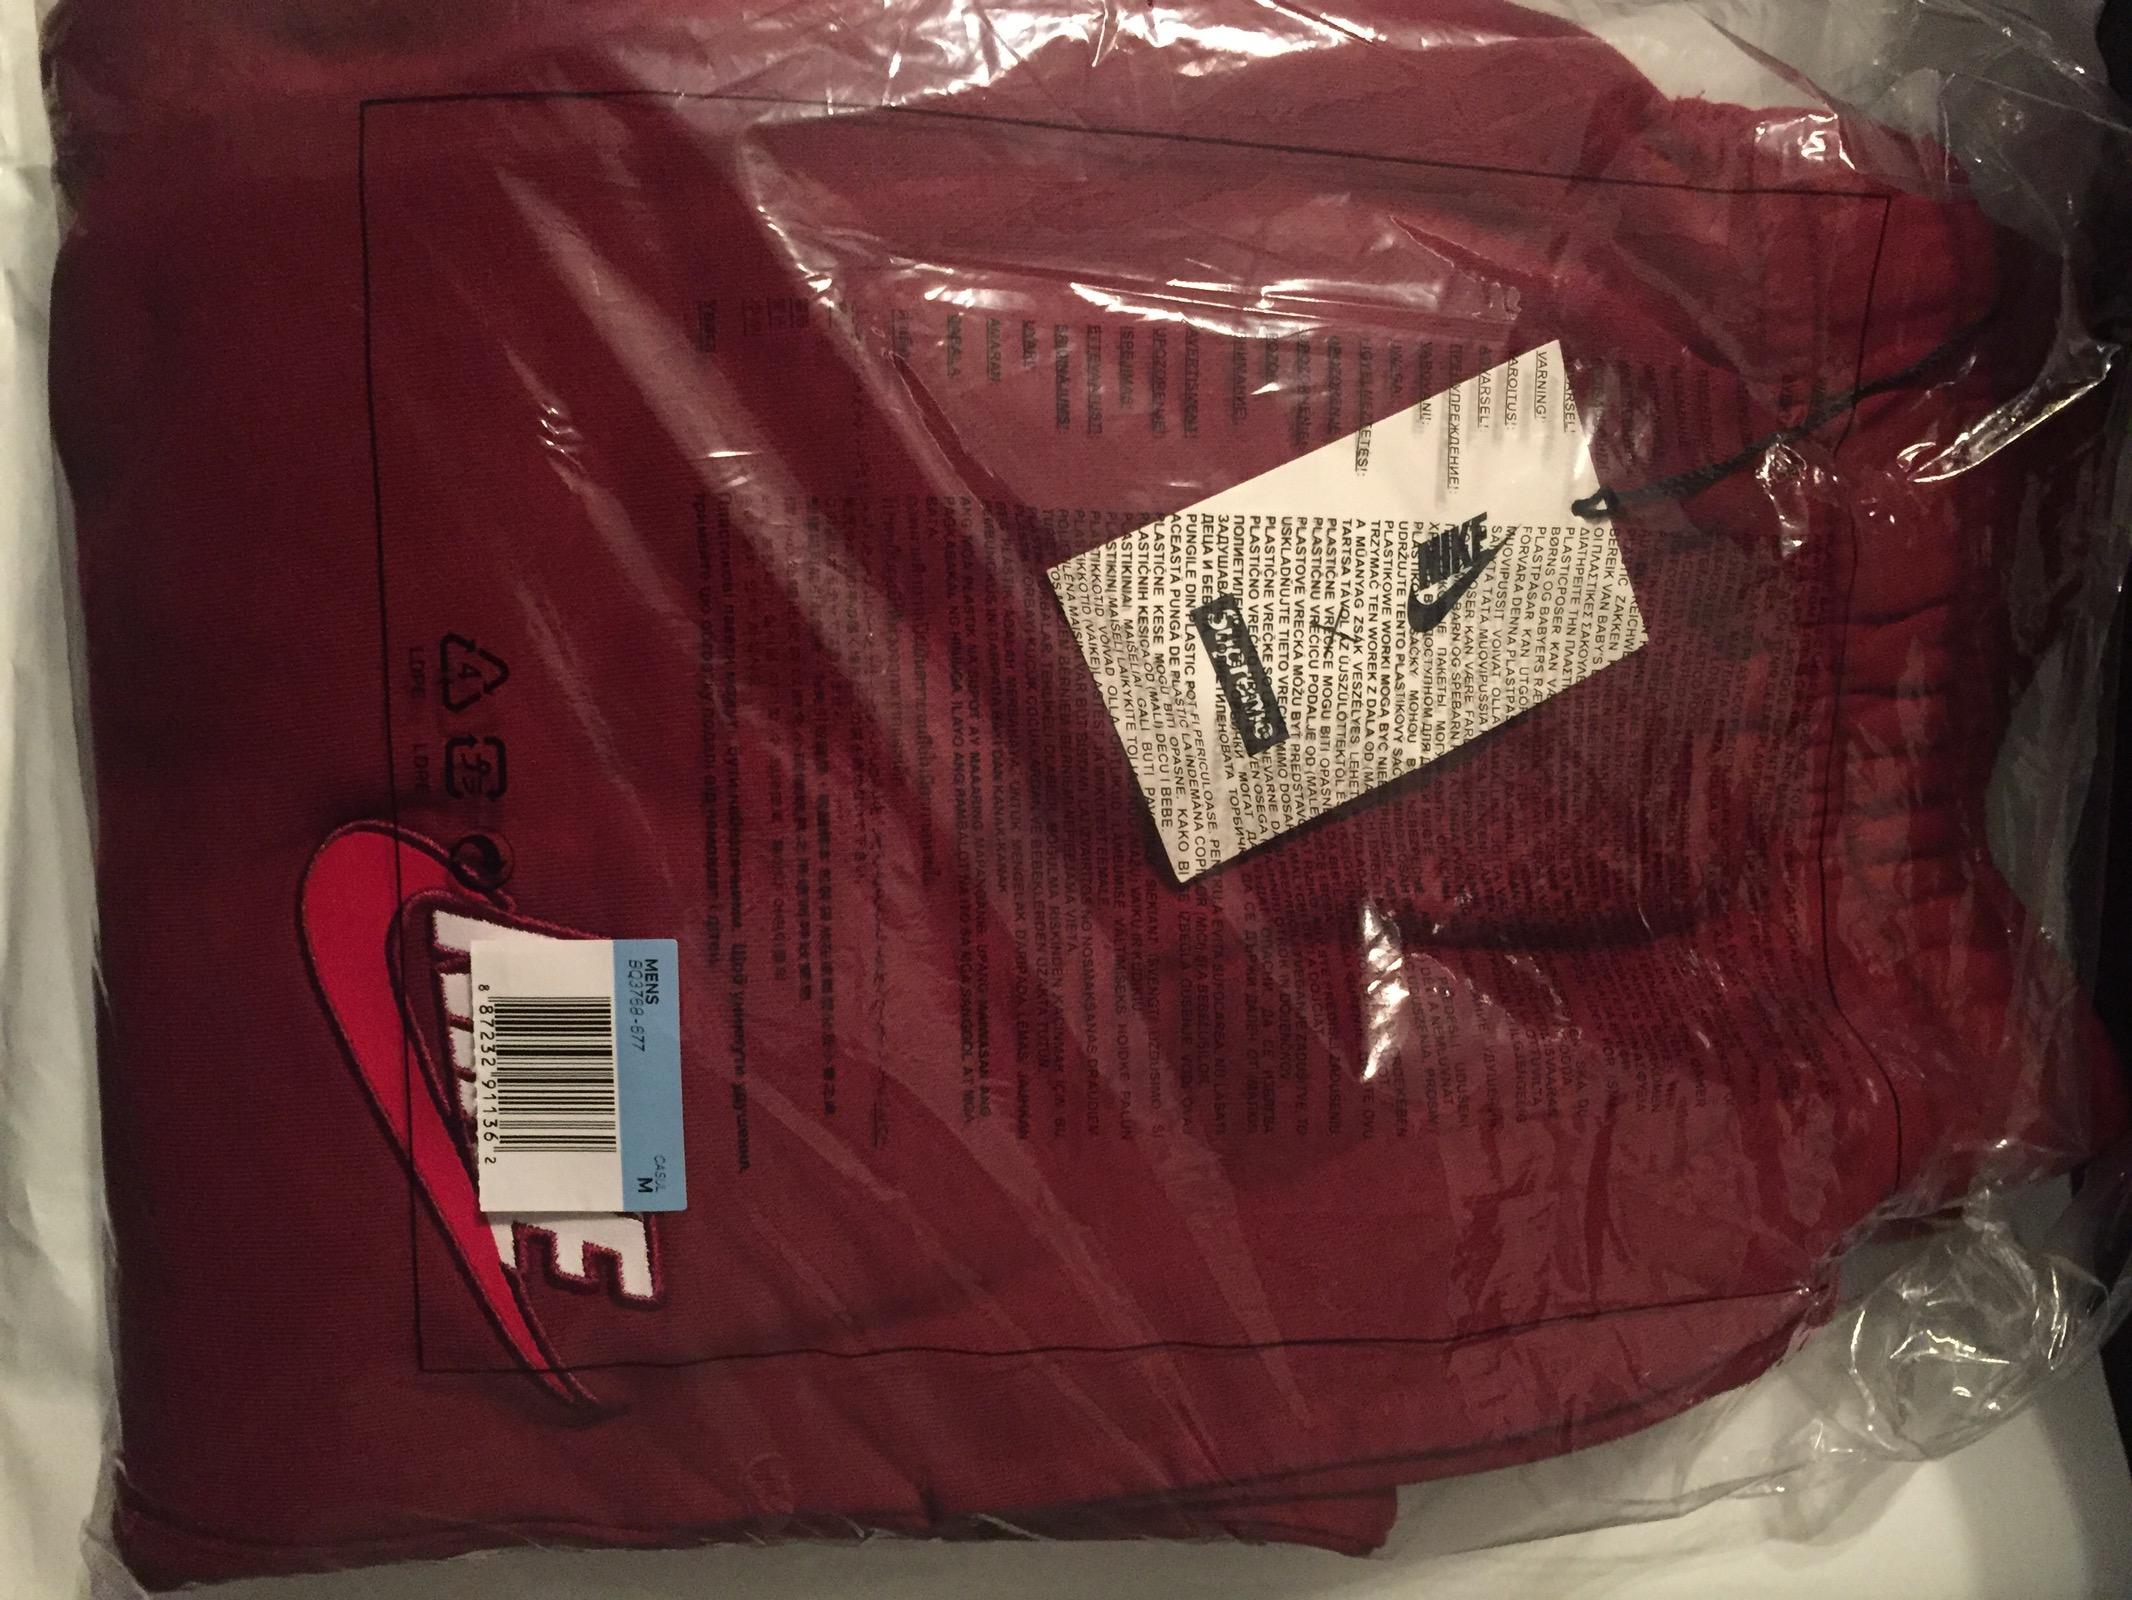 594a57b5 Supreme × Nike ×. Supreme/Nike Sweatpants Burgundy*For retail